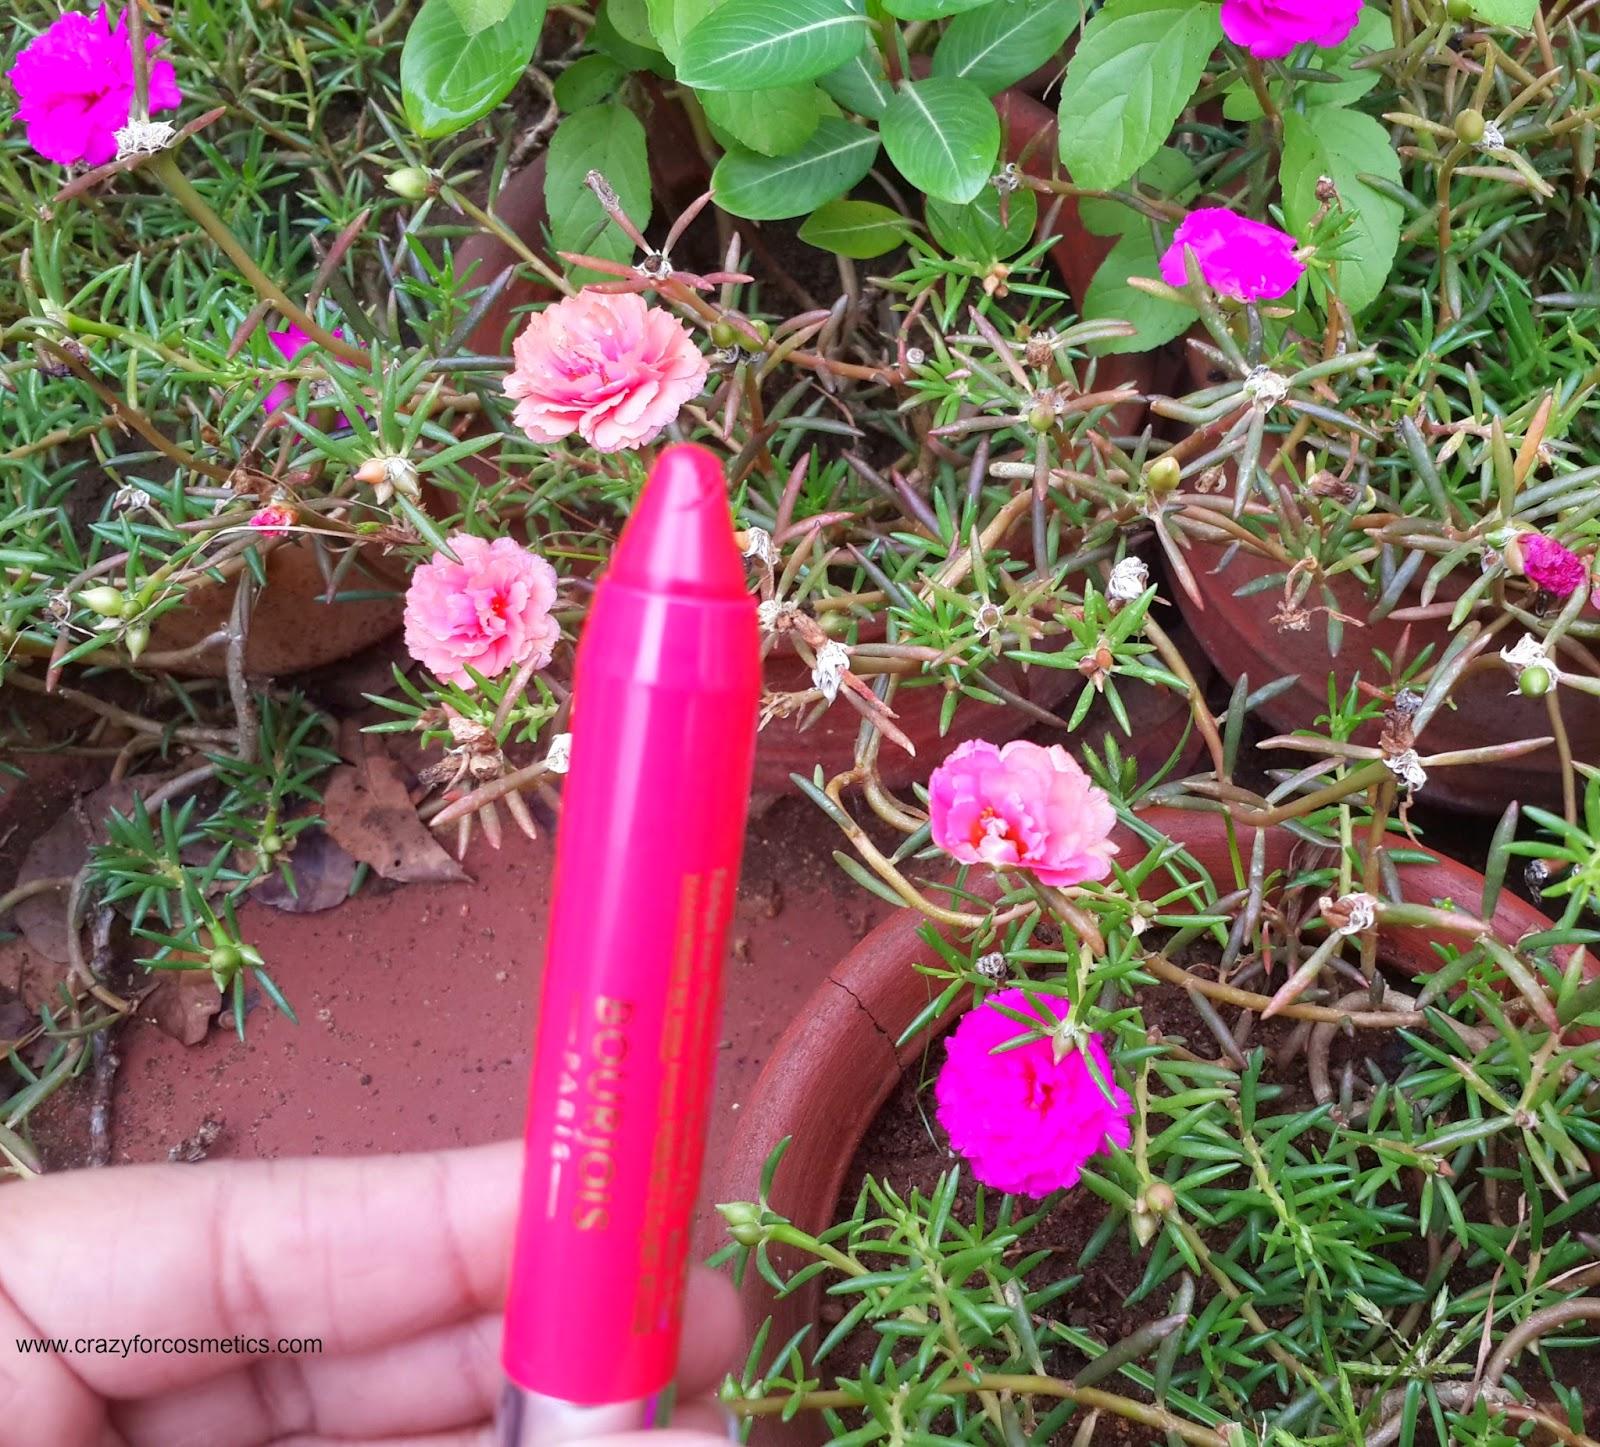 Bourjois Paris Color Boost Lip Crayon in Red Sunrise in India